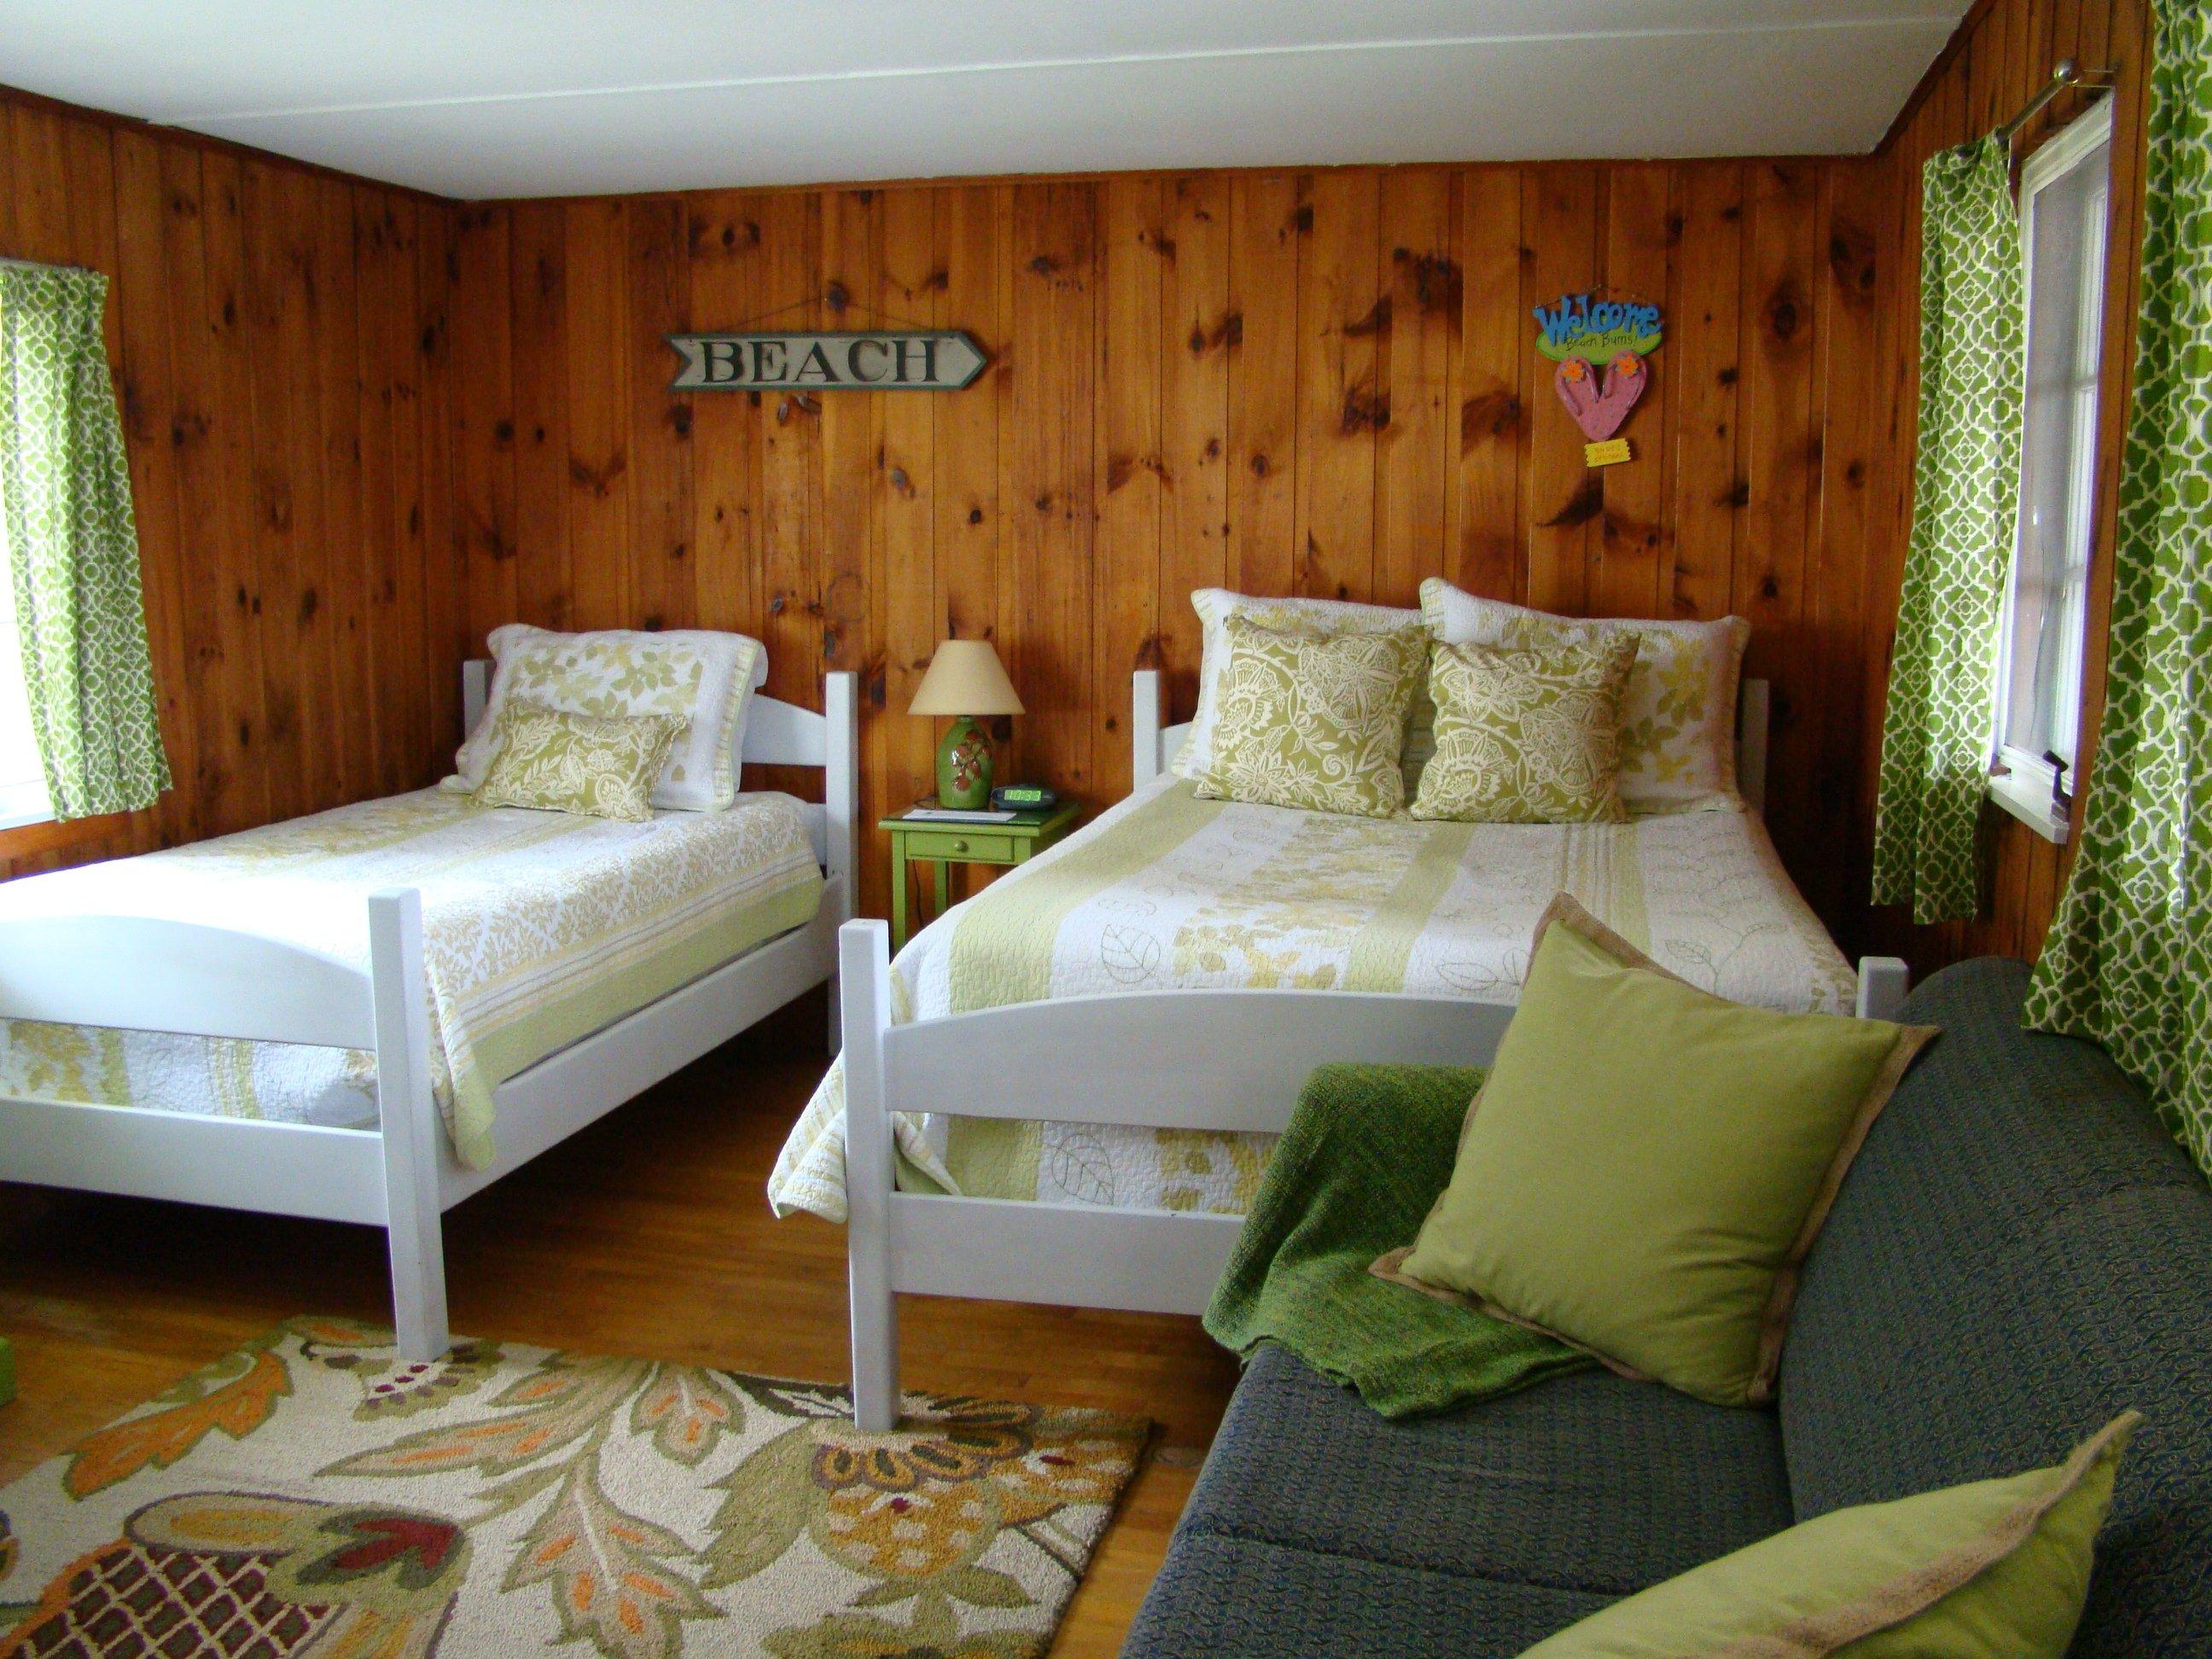 Motel room #13 - full bed, twin bed, full sleeper sofa, TV, refrigerator, microwave, coffeemaker